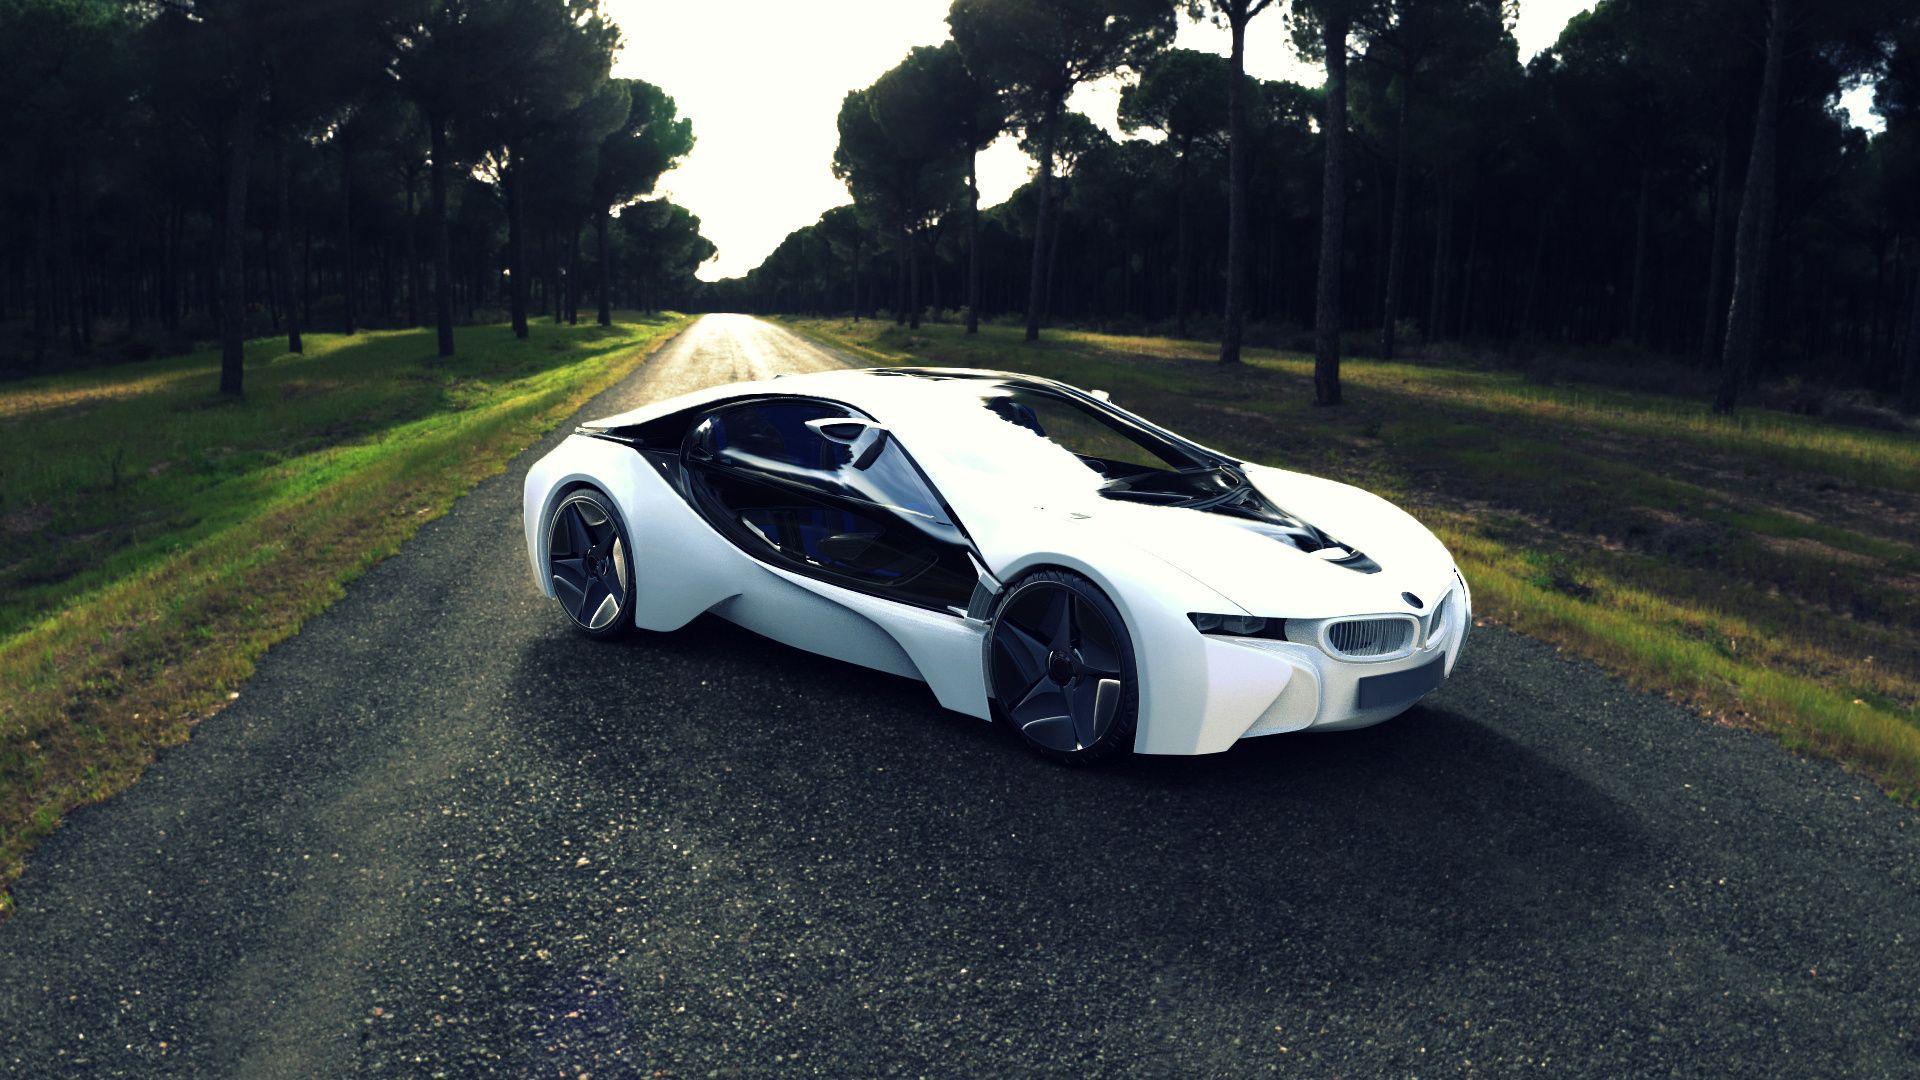 Bmw I8 Concept Sports Car Wallpaper Bmw I8 Bmw Wallpapers